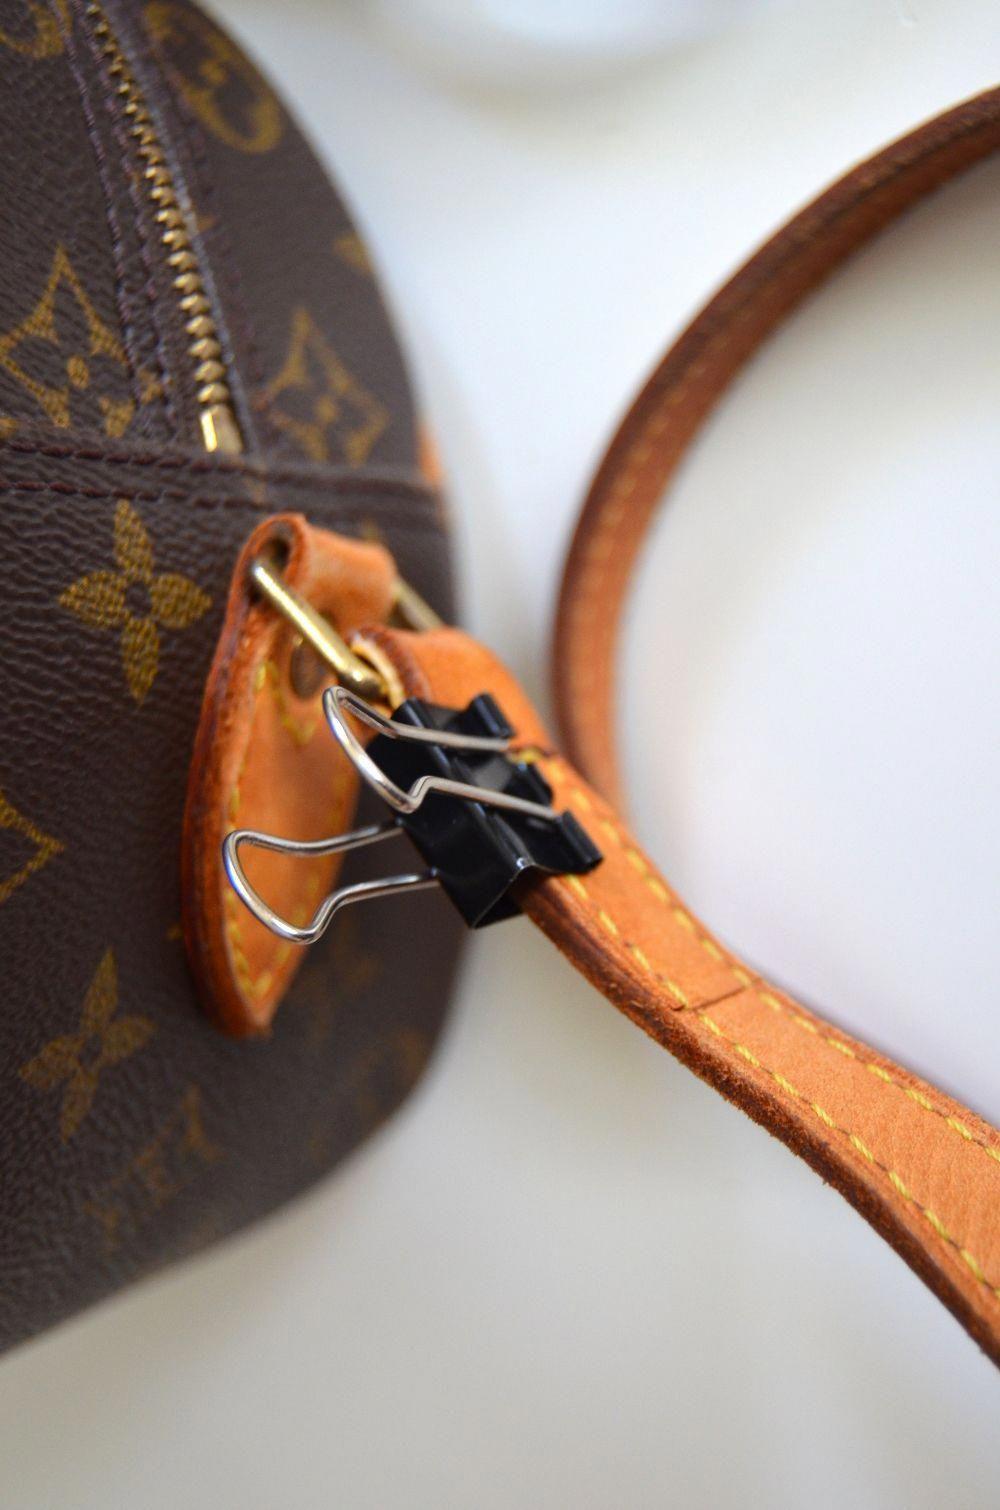 fb7a8f5c6dea how to fix fixing torn ripped broken Louis Vuitton shoulder strap   Louisvuittonhandbags. Visit. January 2019